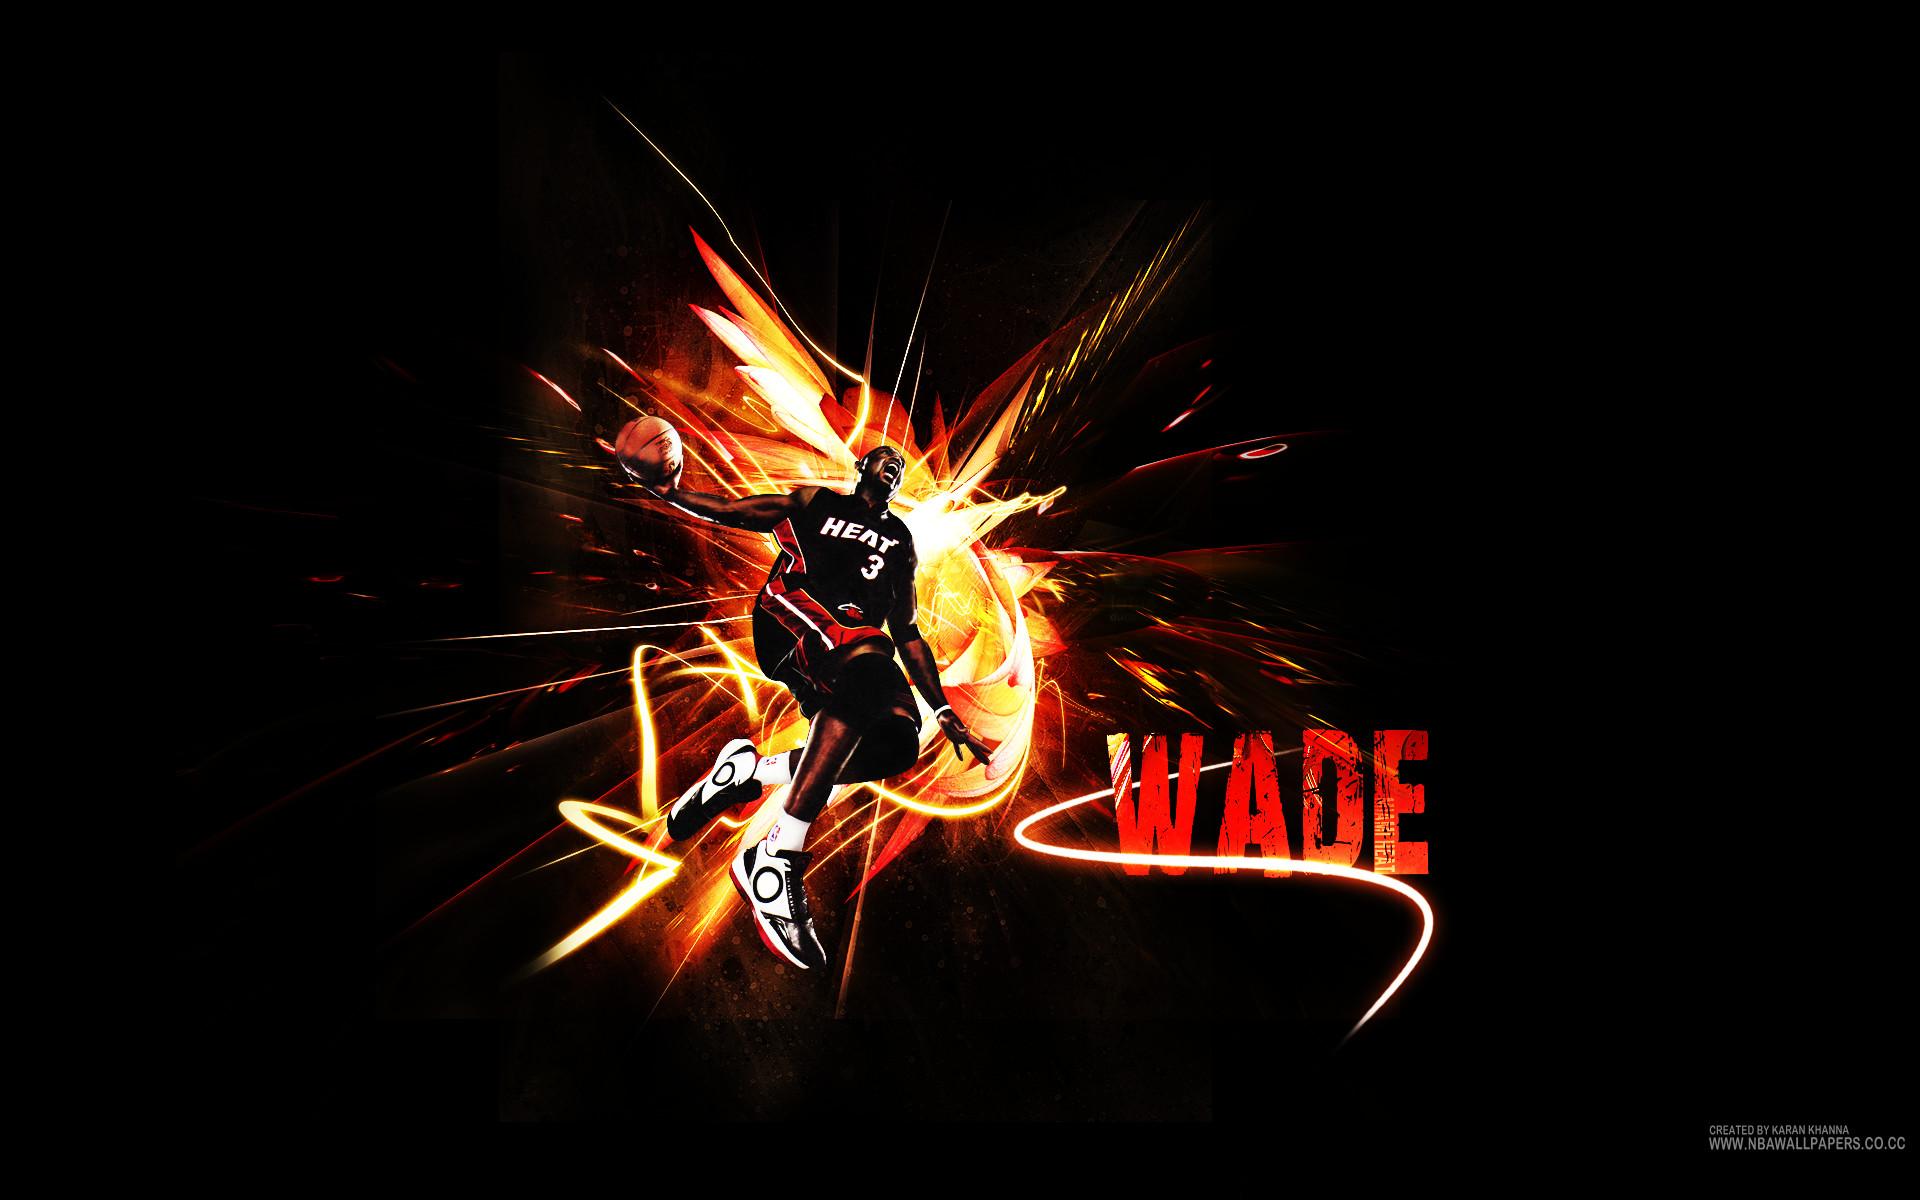 Miami Heat Wallpaper Hd 600×375 Dwayne Wade Miami Heat Wallpaper Hd ..